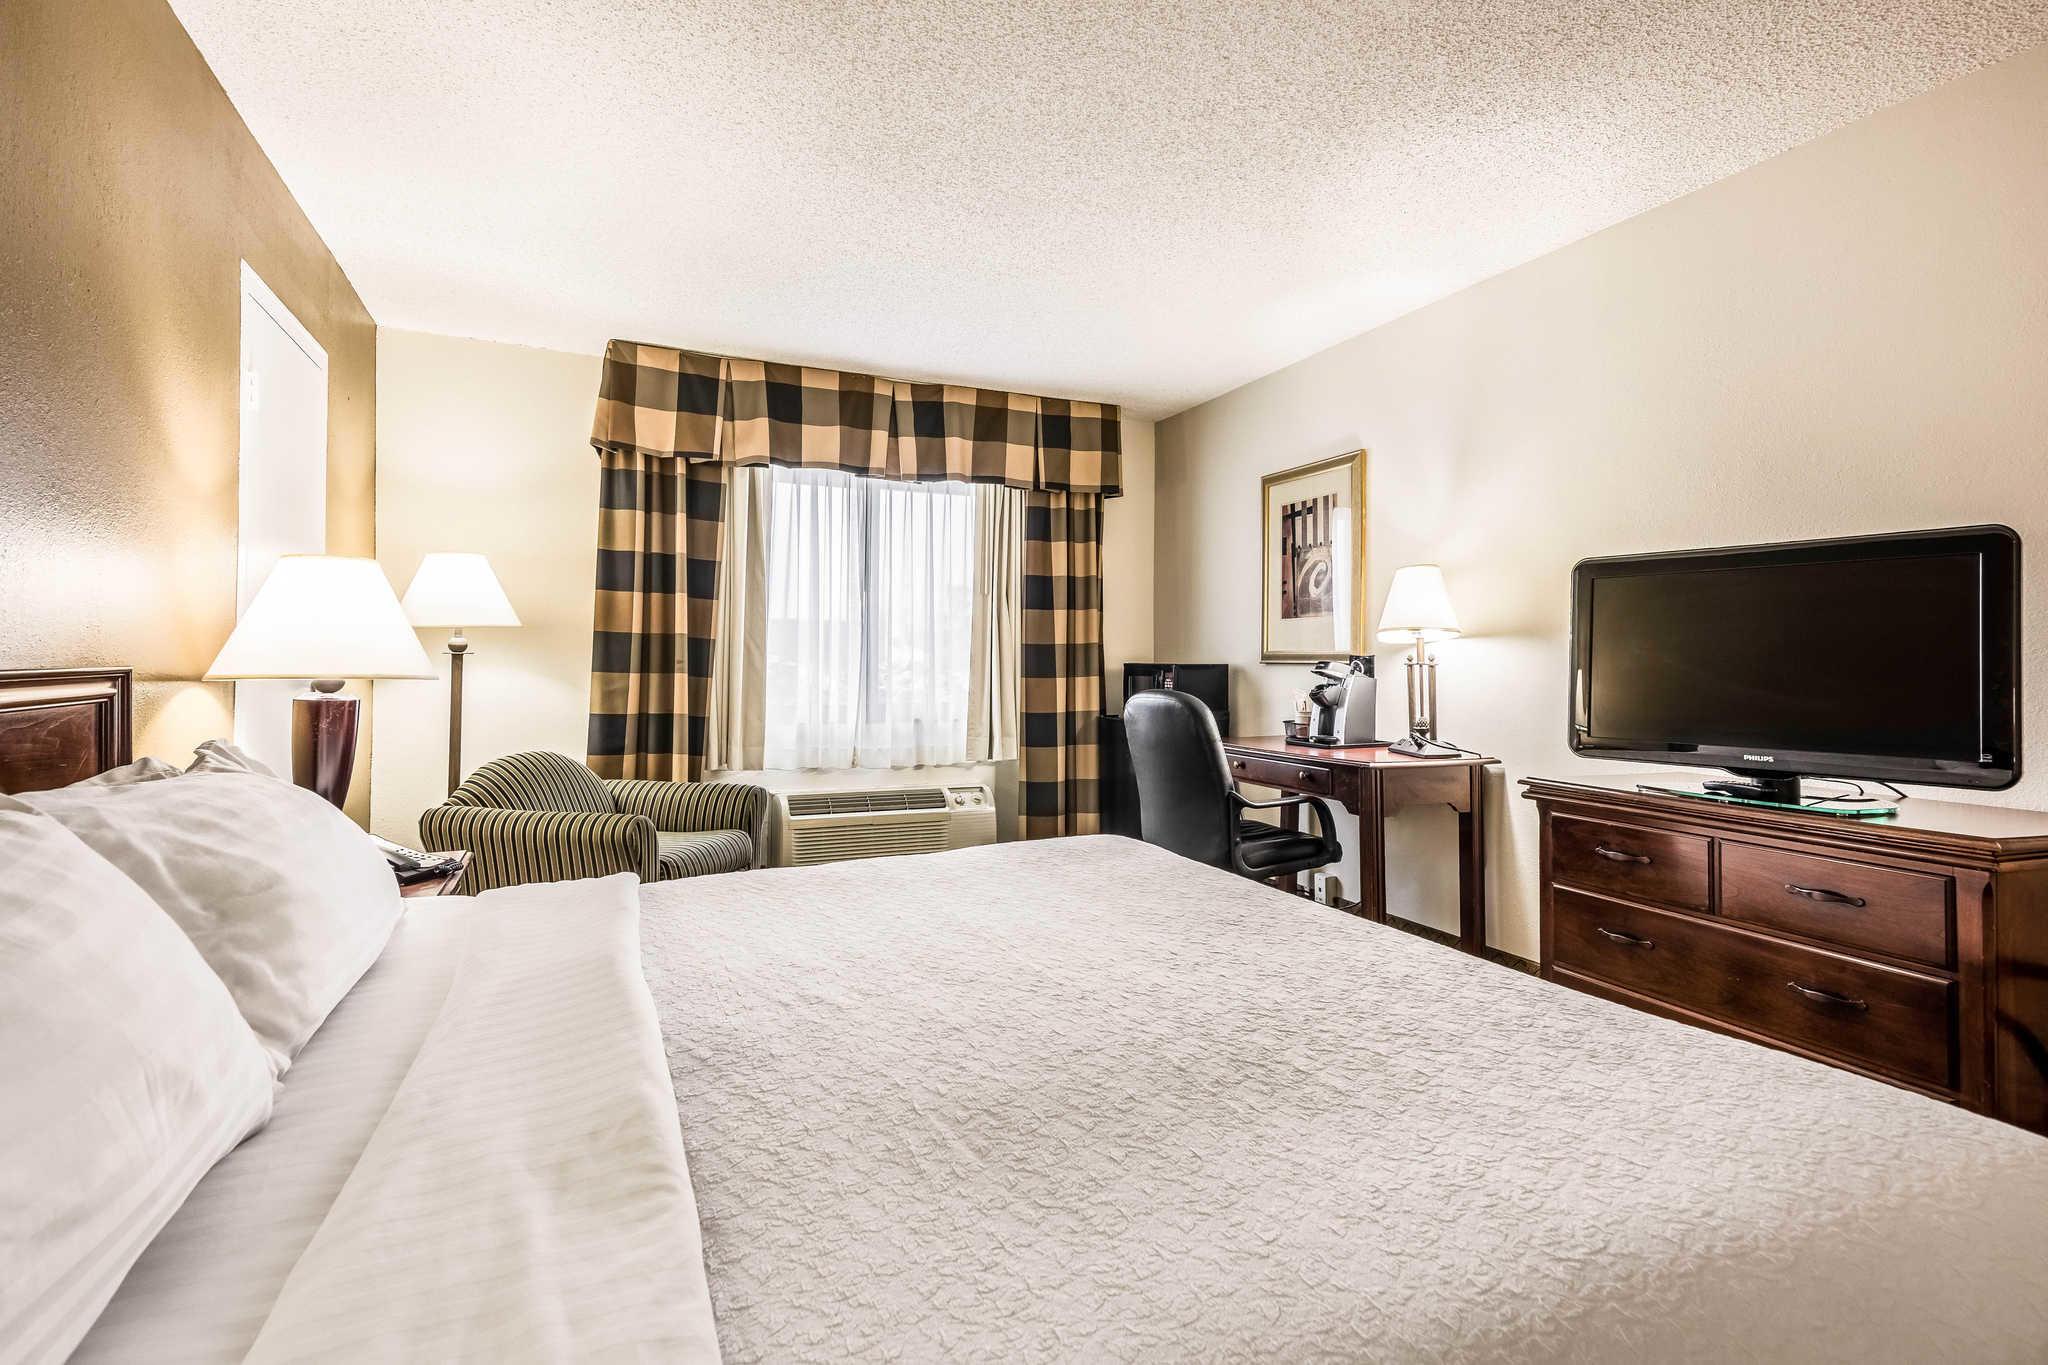 Quality Inn near Finger Lakes and Seneca Falls image 11